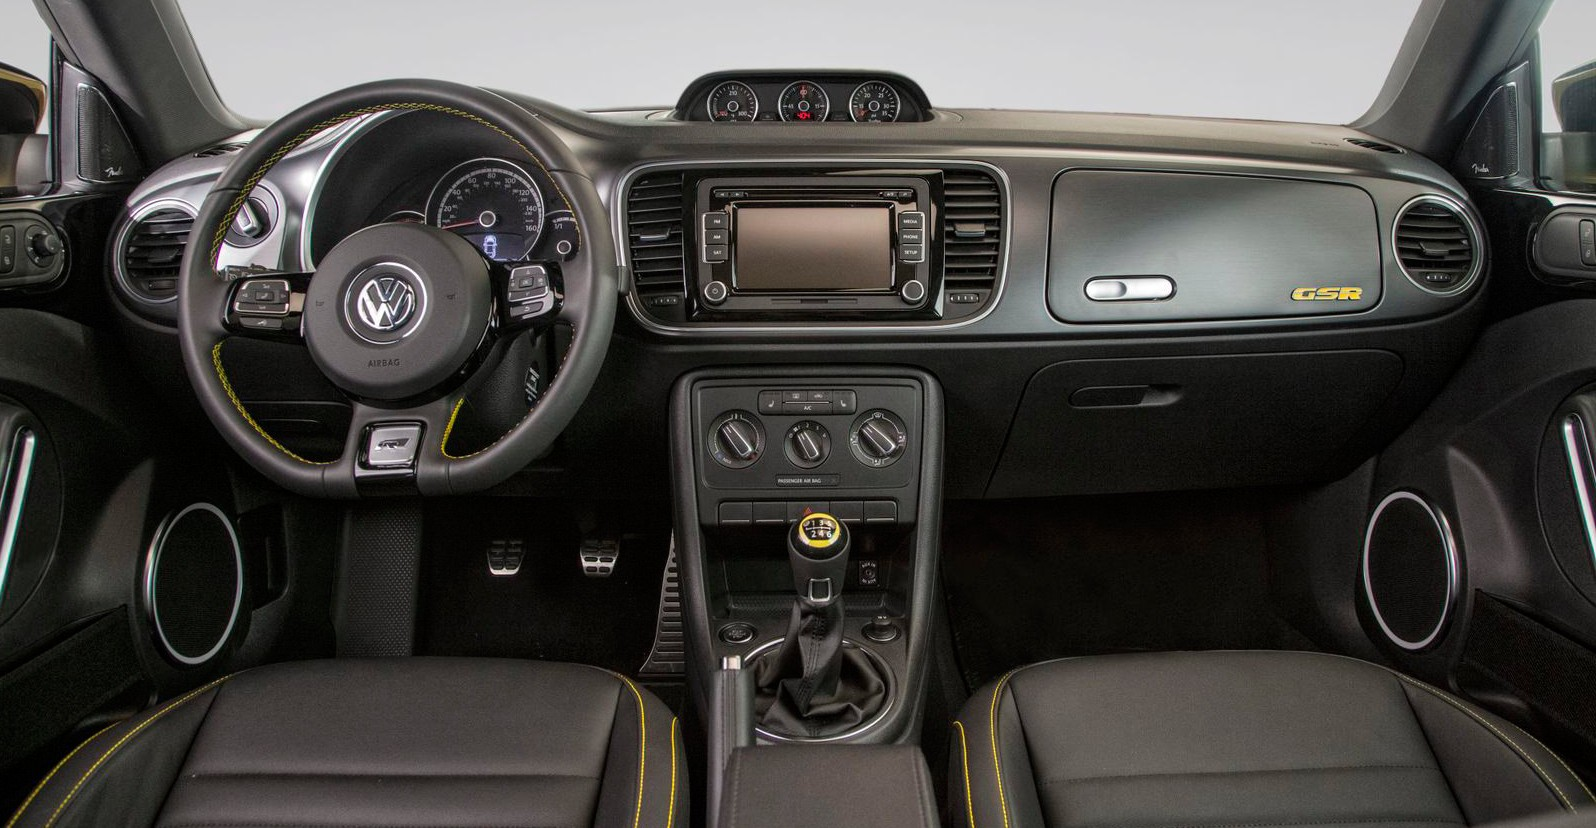 Audi R8 MSS Mk2 test mule 823 110x60 photo